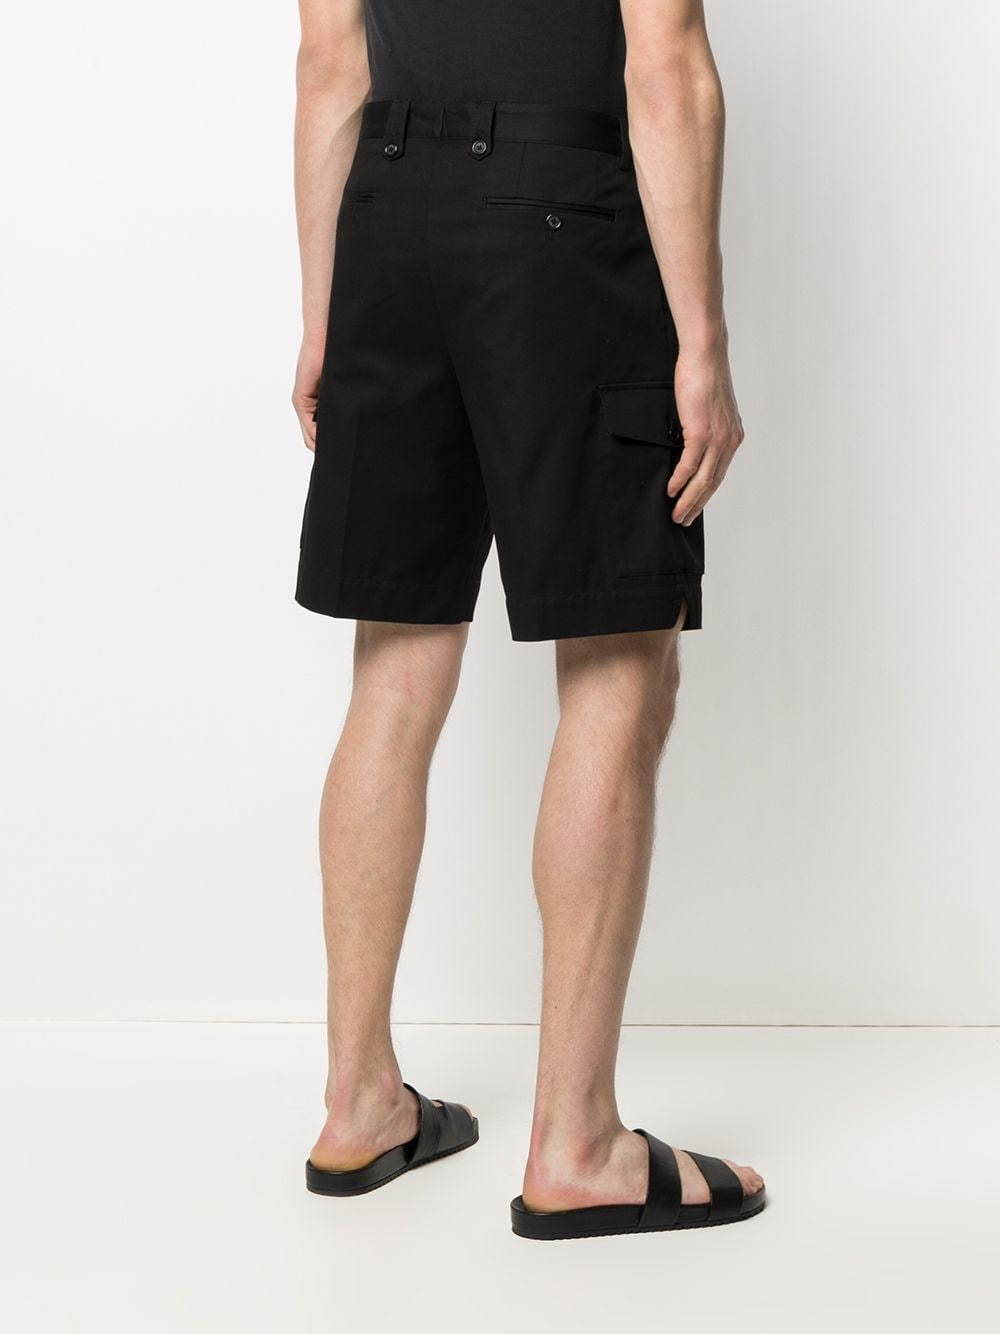 Black stretch cotton high-rise cargo shorts   DOLCE & GABBANA |  | GW3JAT-FUFJUN0000